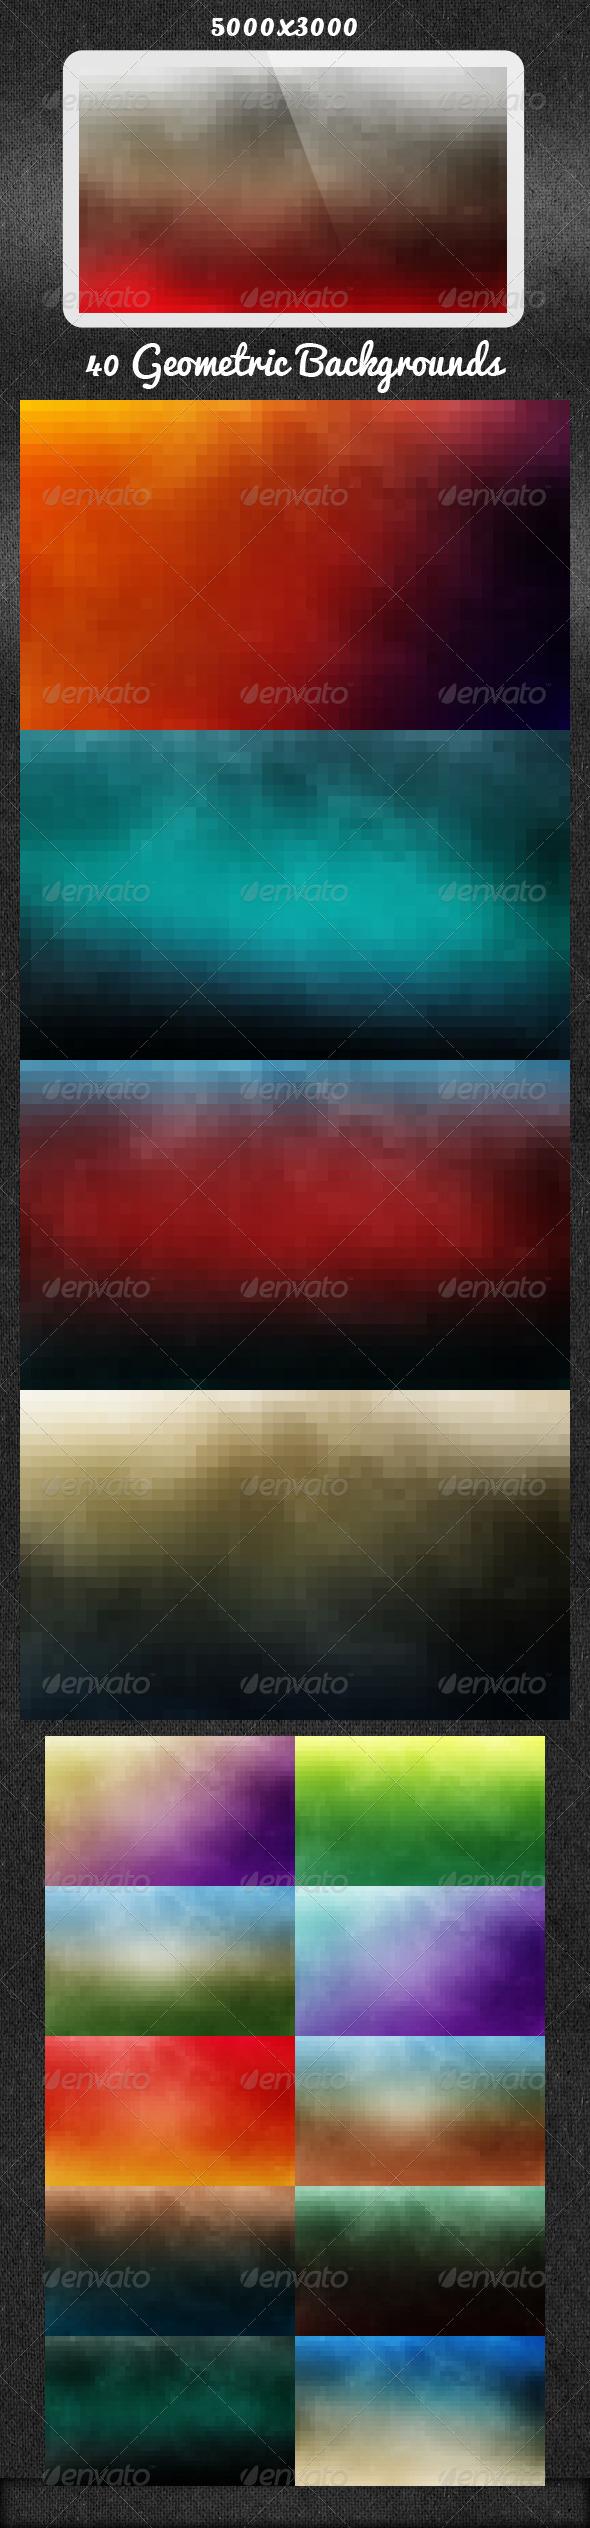 40 Geometric Backgrounds